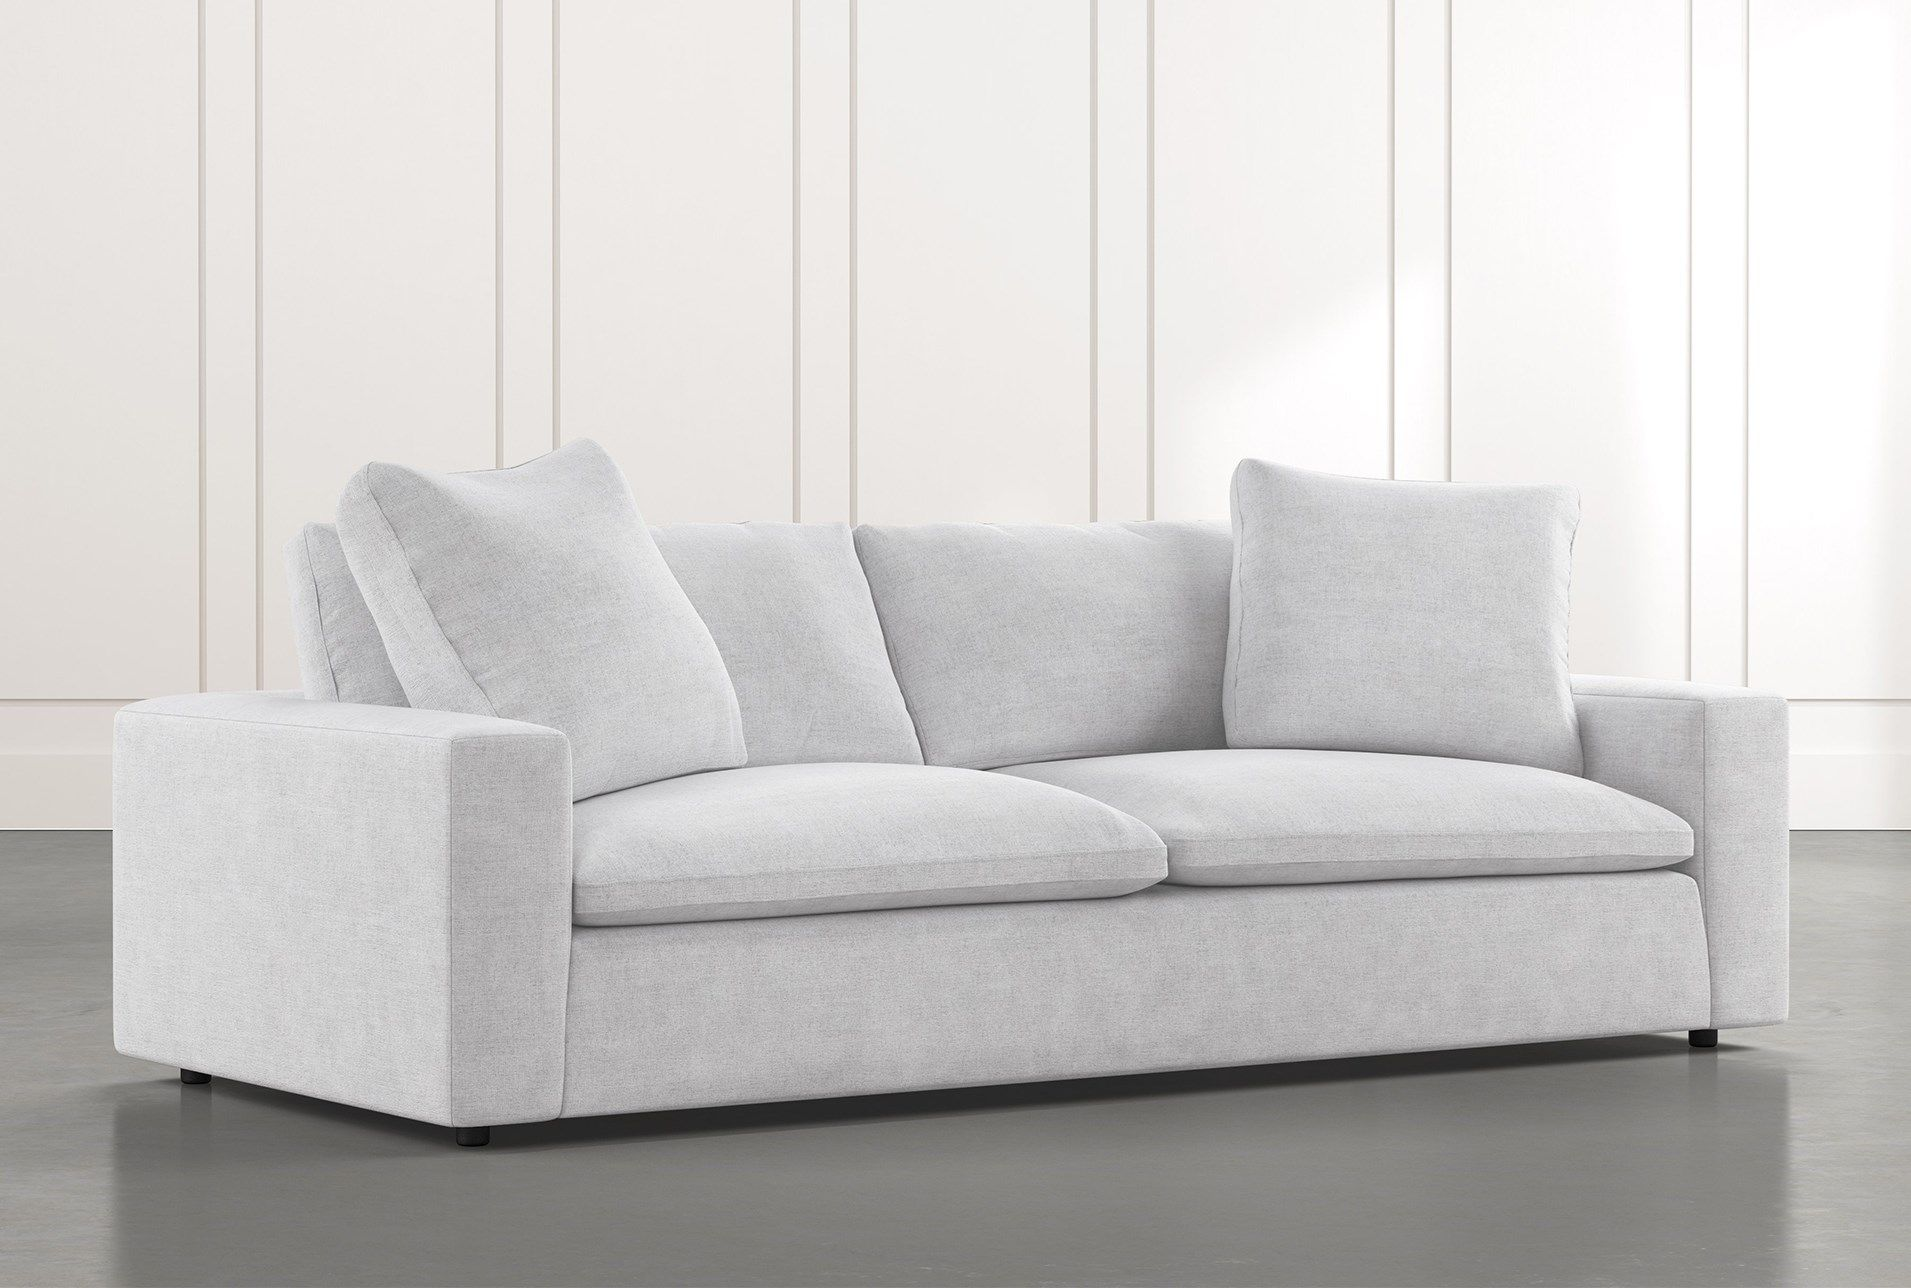 Utopia Light Grey Sofa Light Gray Sofas Gray Sofa Sofa